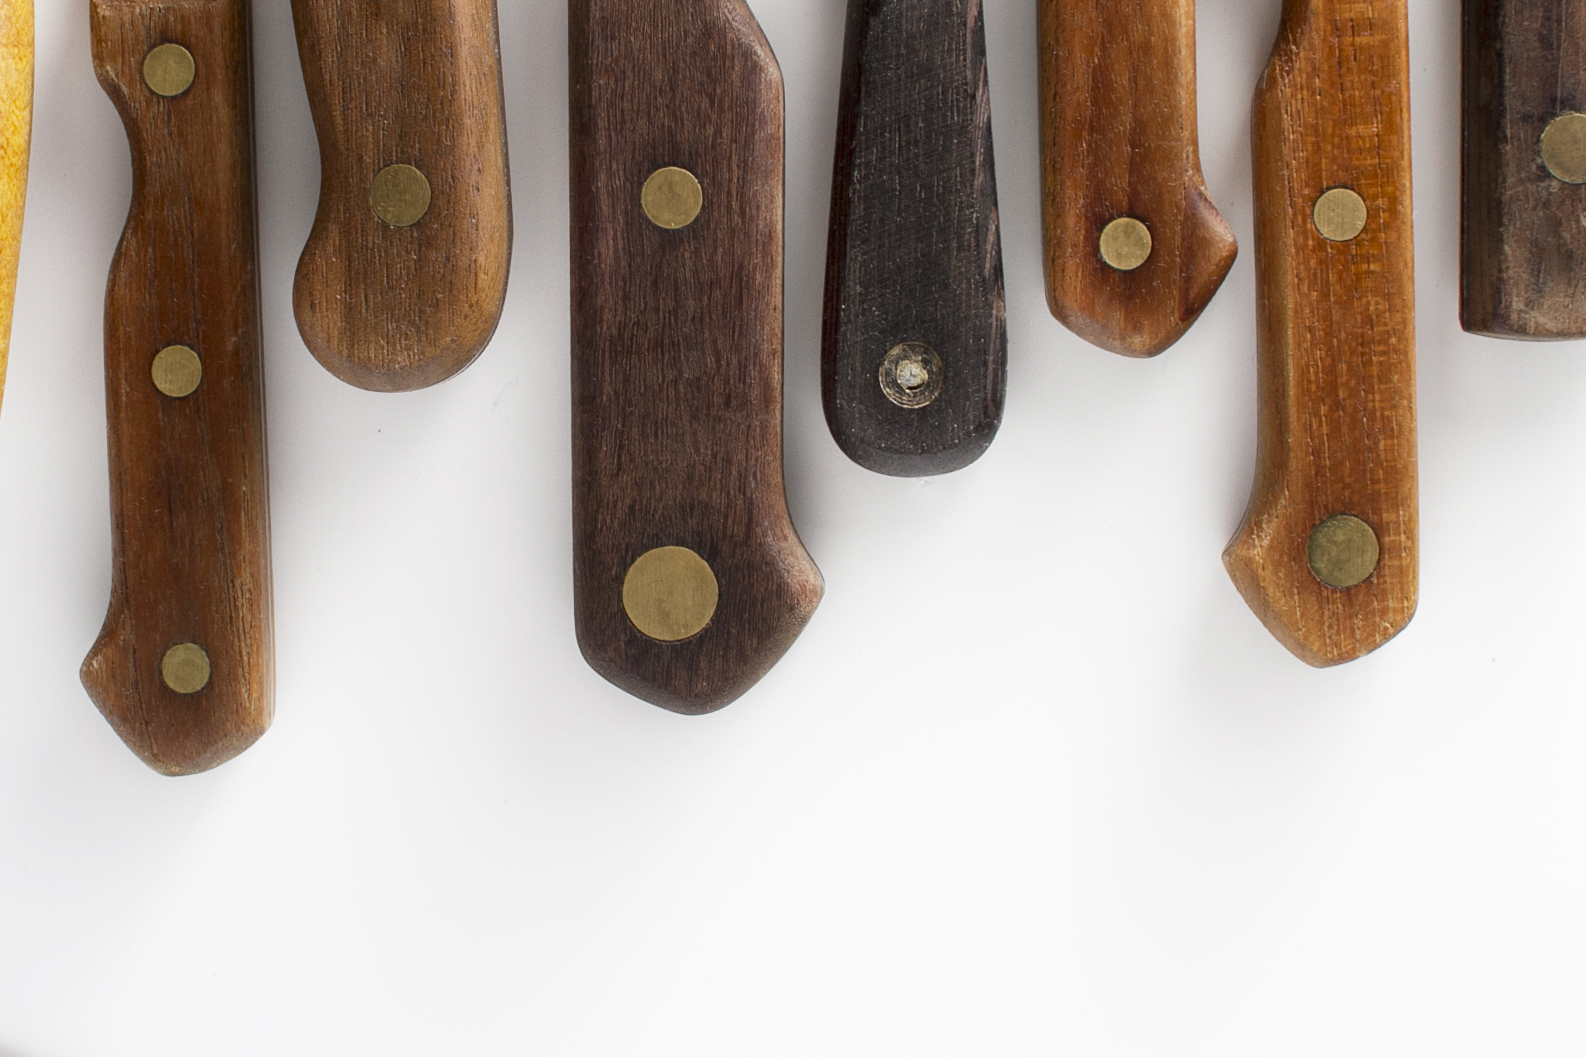 Basic Knife Skills | 18reasons.org